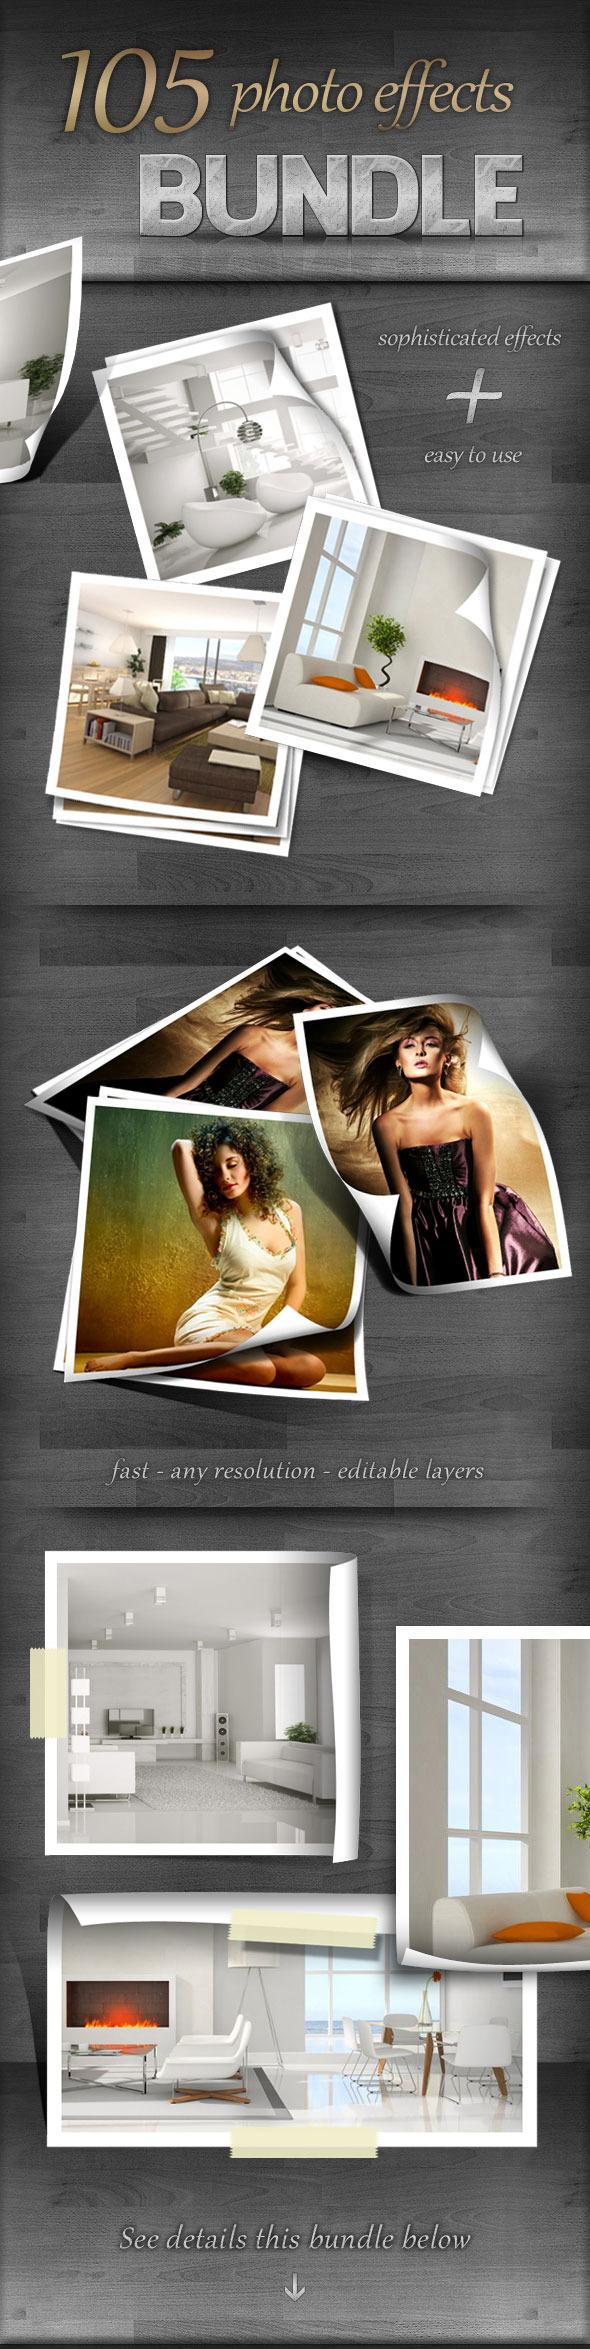 105 Photo Effects - Bundle - Utilities Actions